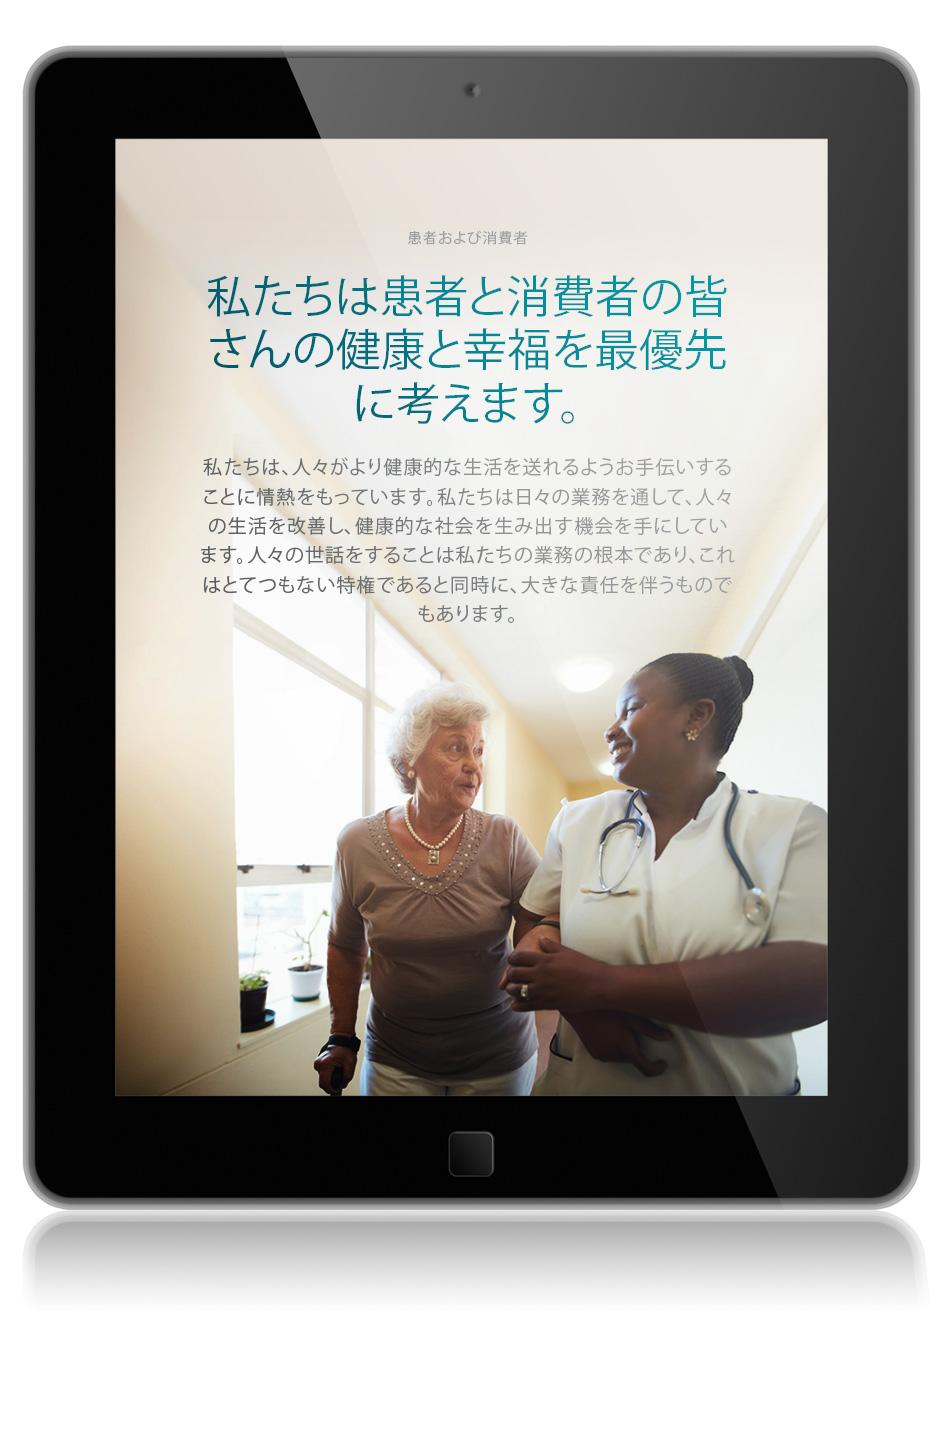 OurWork_Train75k_iPad_Japanese.jpg